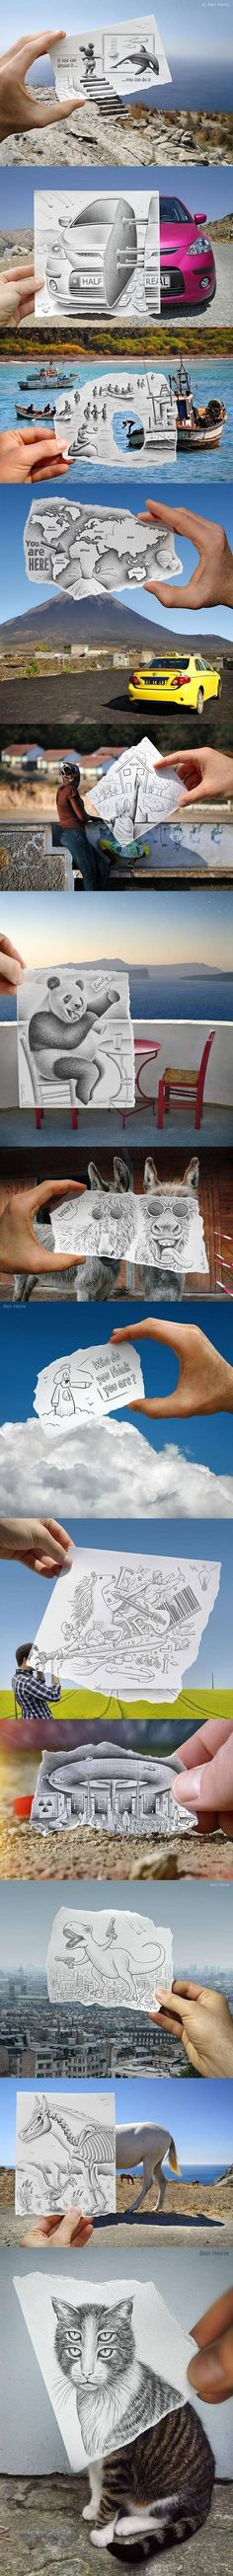 Pencil vs. Camera - Imgur